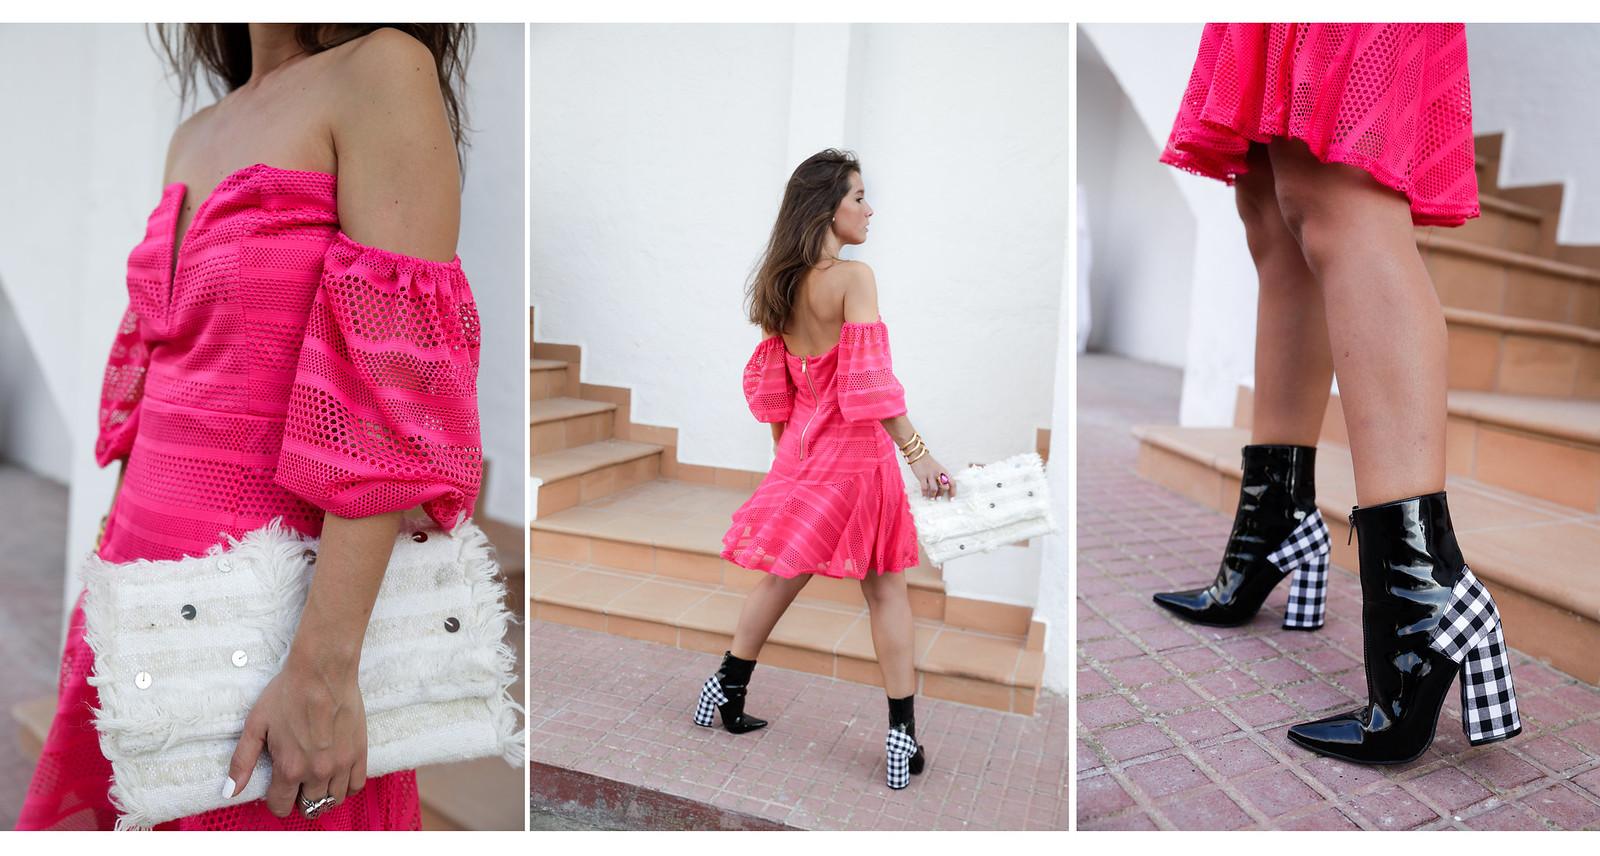 011_vestido_rosa_off_shoulder_danity_paris_pink_dress_theguestgirl_outfit_boots_vichy_trend_alert